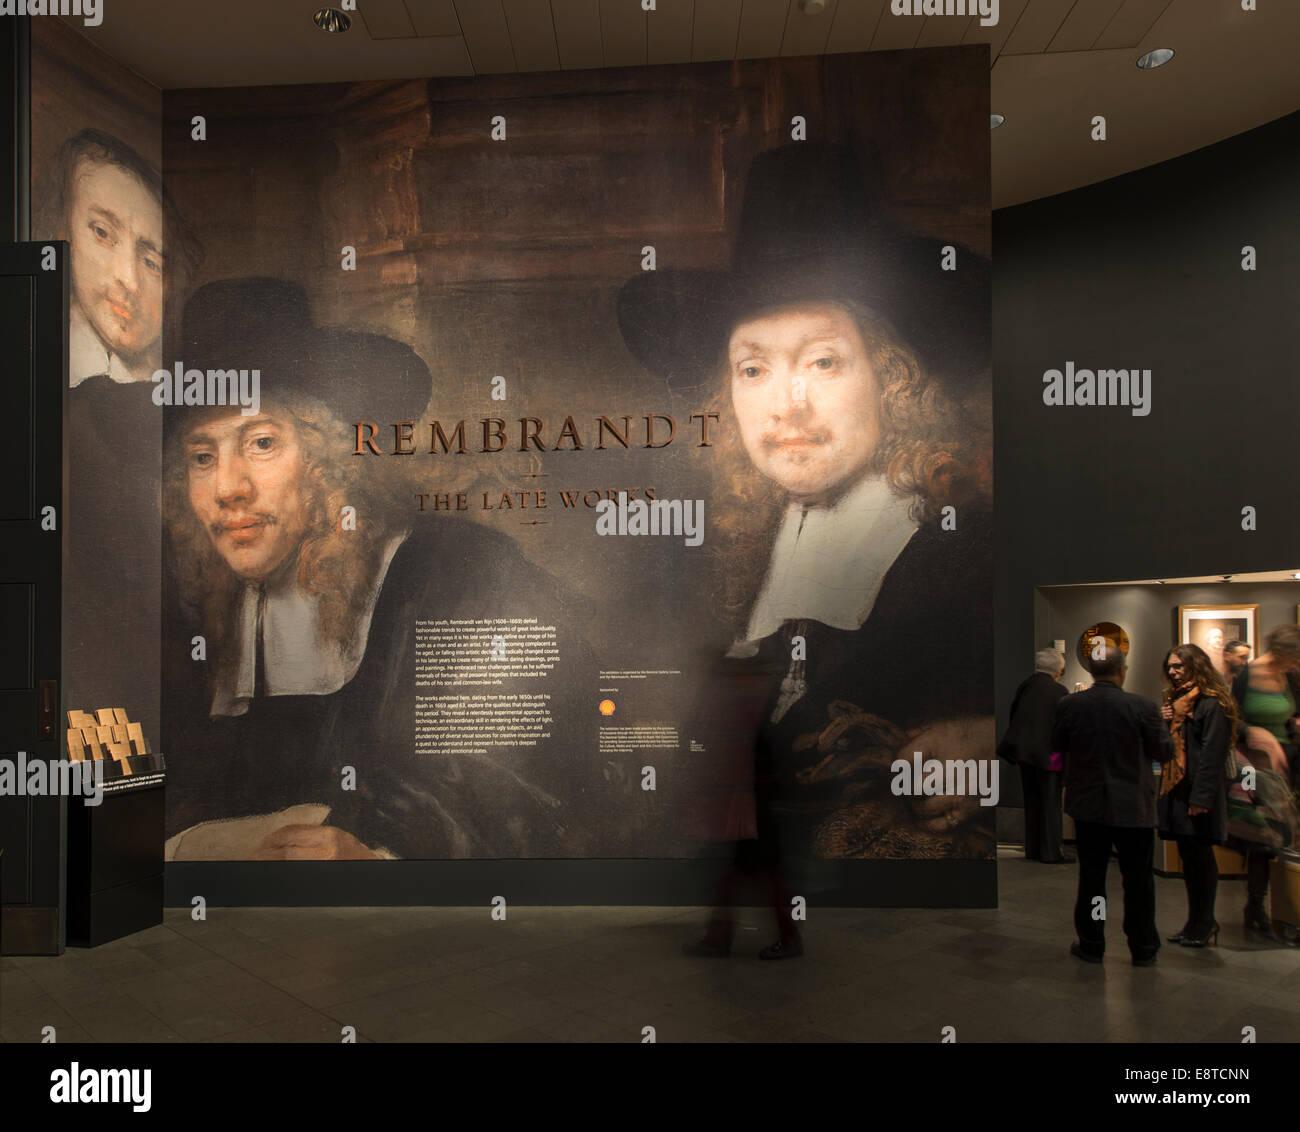 Rembrandt Exhibition Shell : Announcement for joseph goldyne exhibition diatrope books